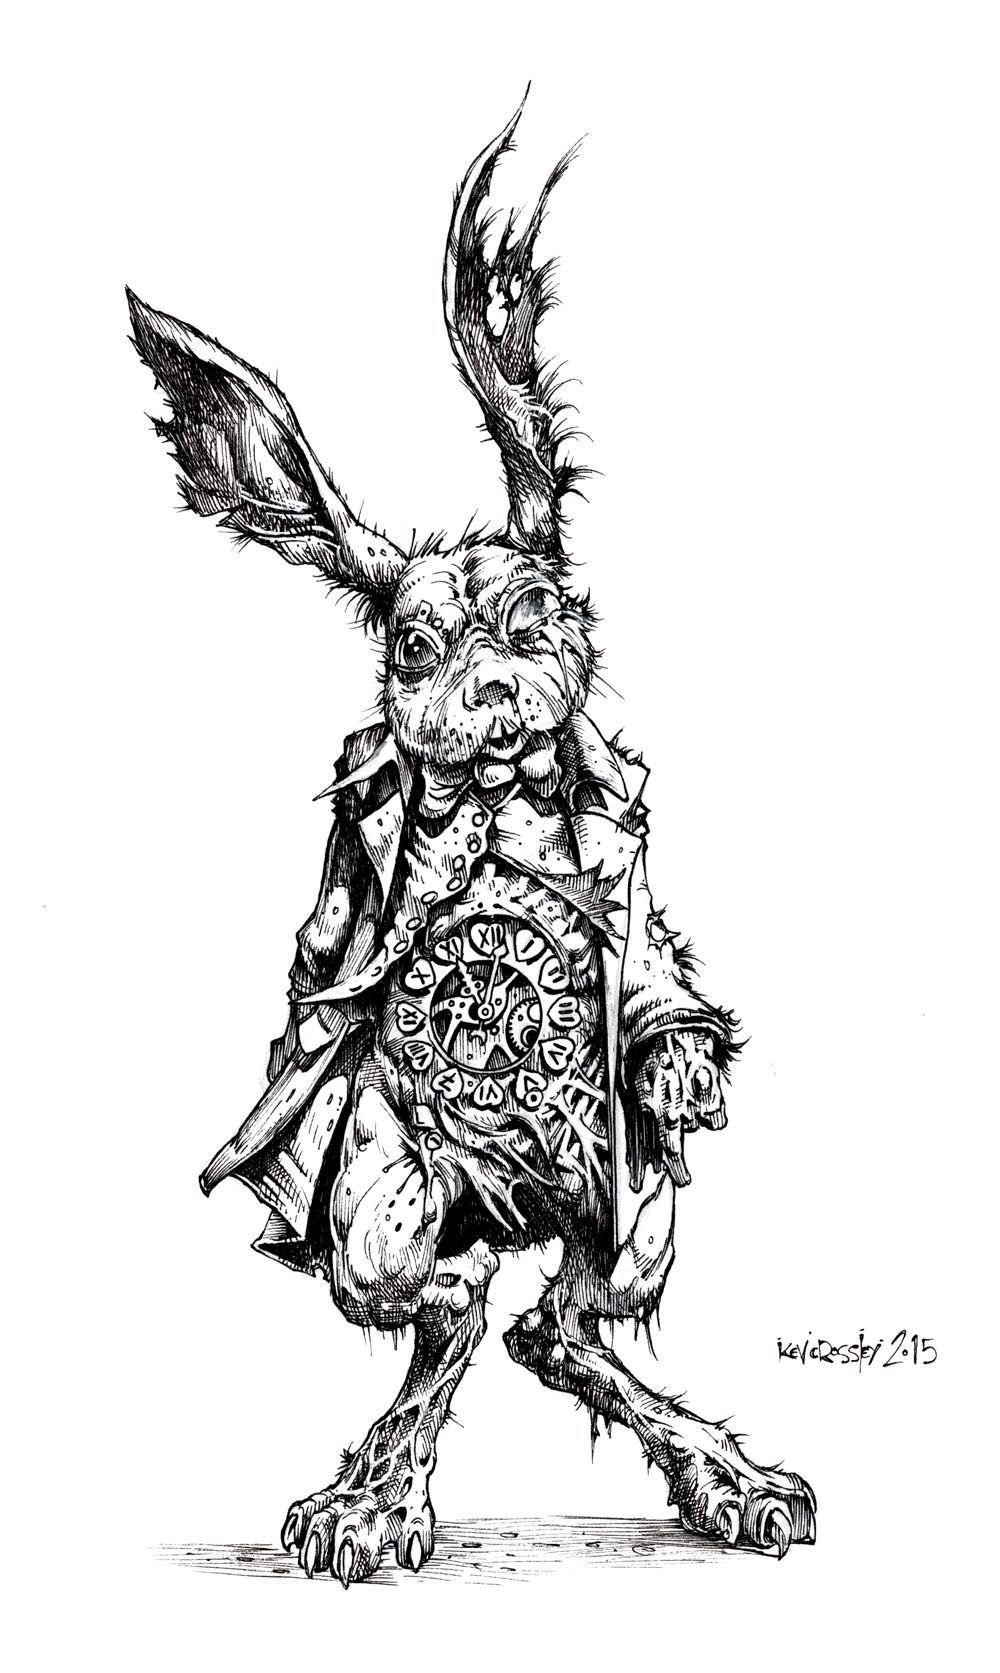 White Rabbit by Kev Crossley